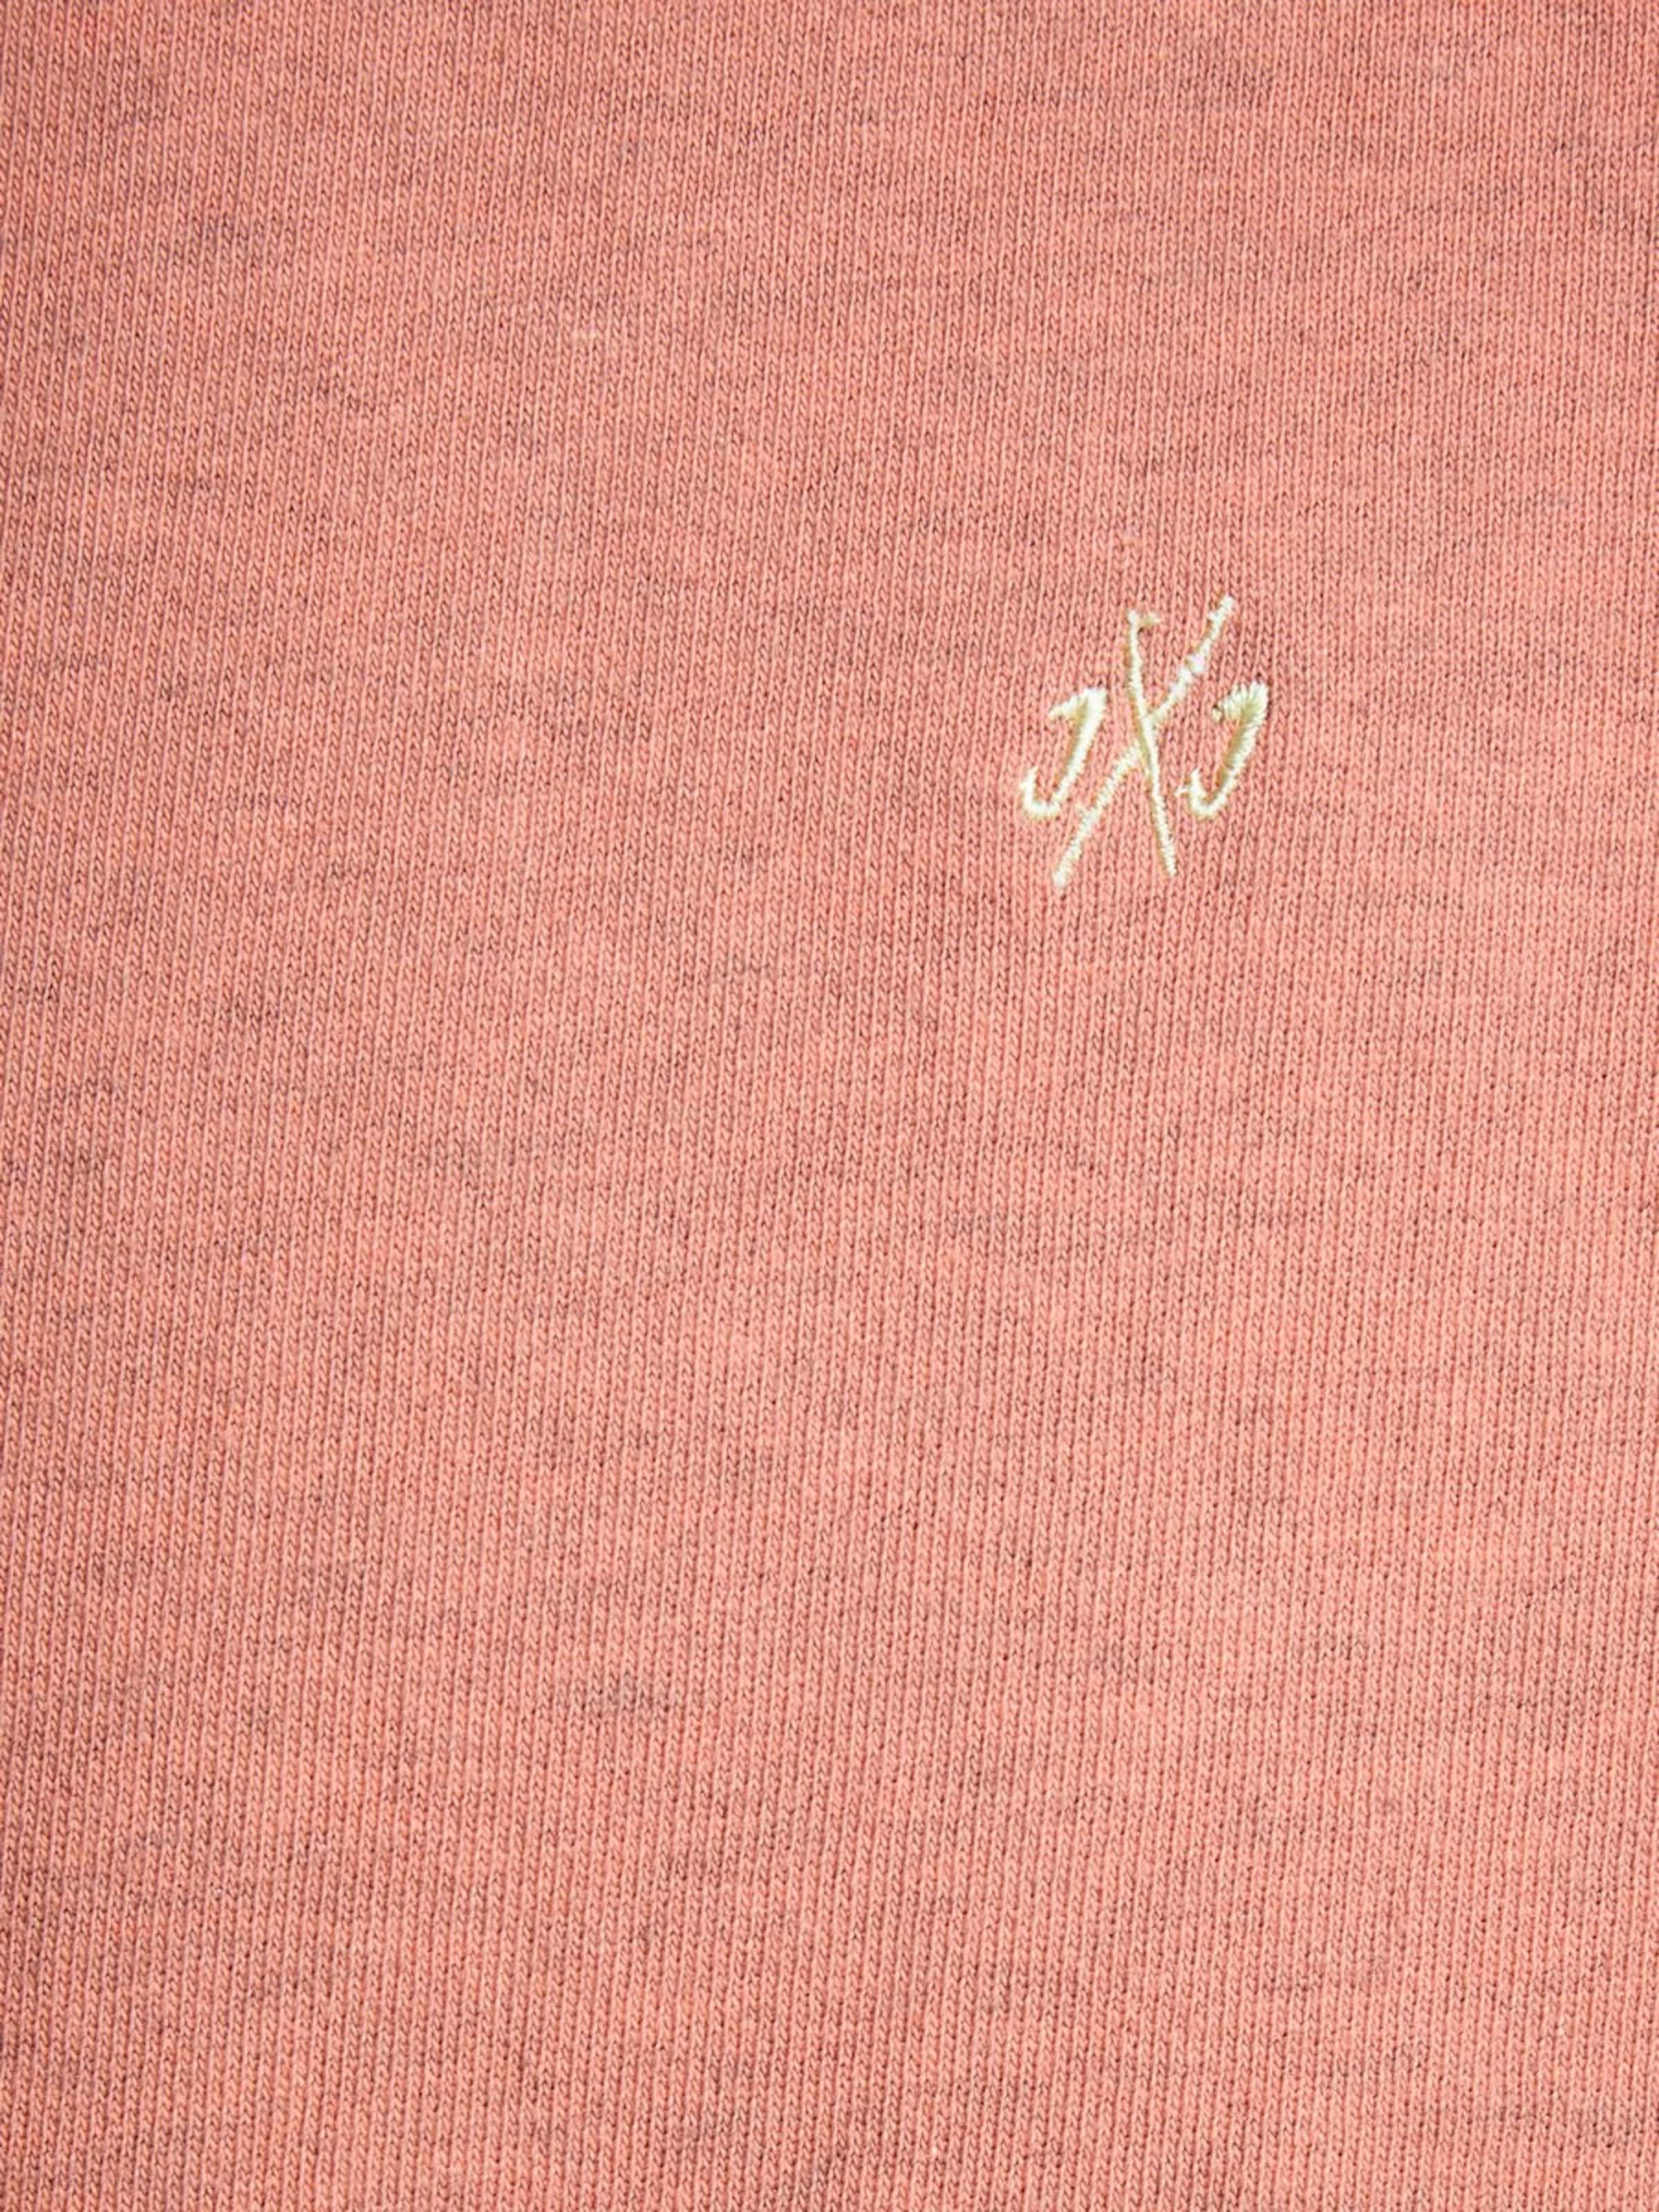 shirt Sweat Jones Jackamp; Bleu En Nuit roxCBde